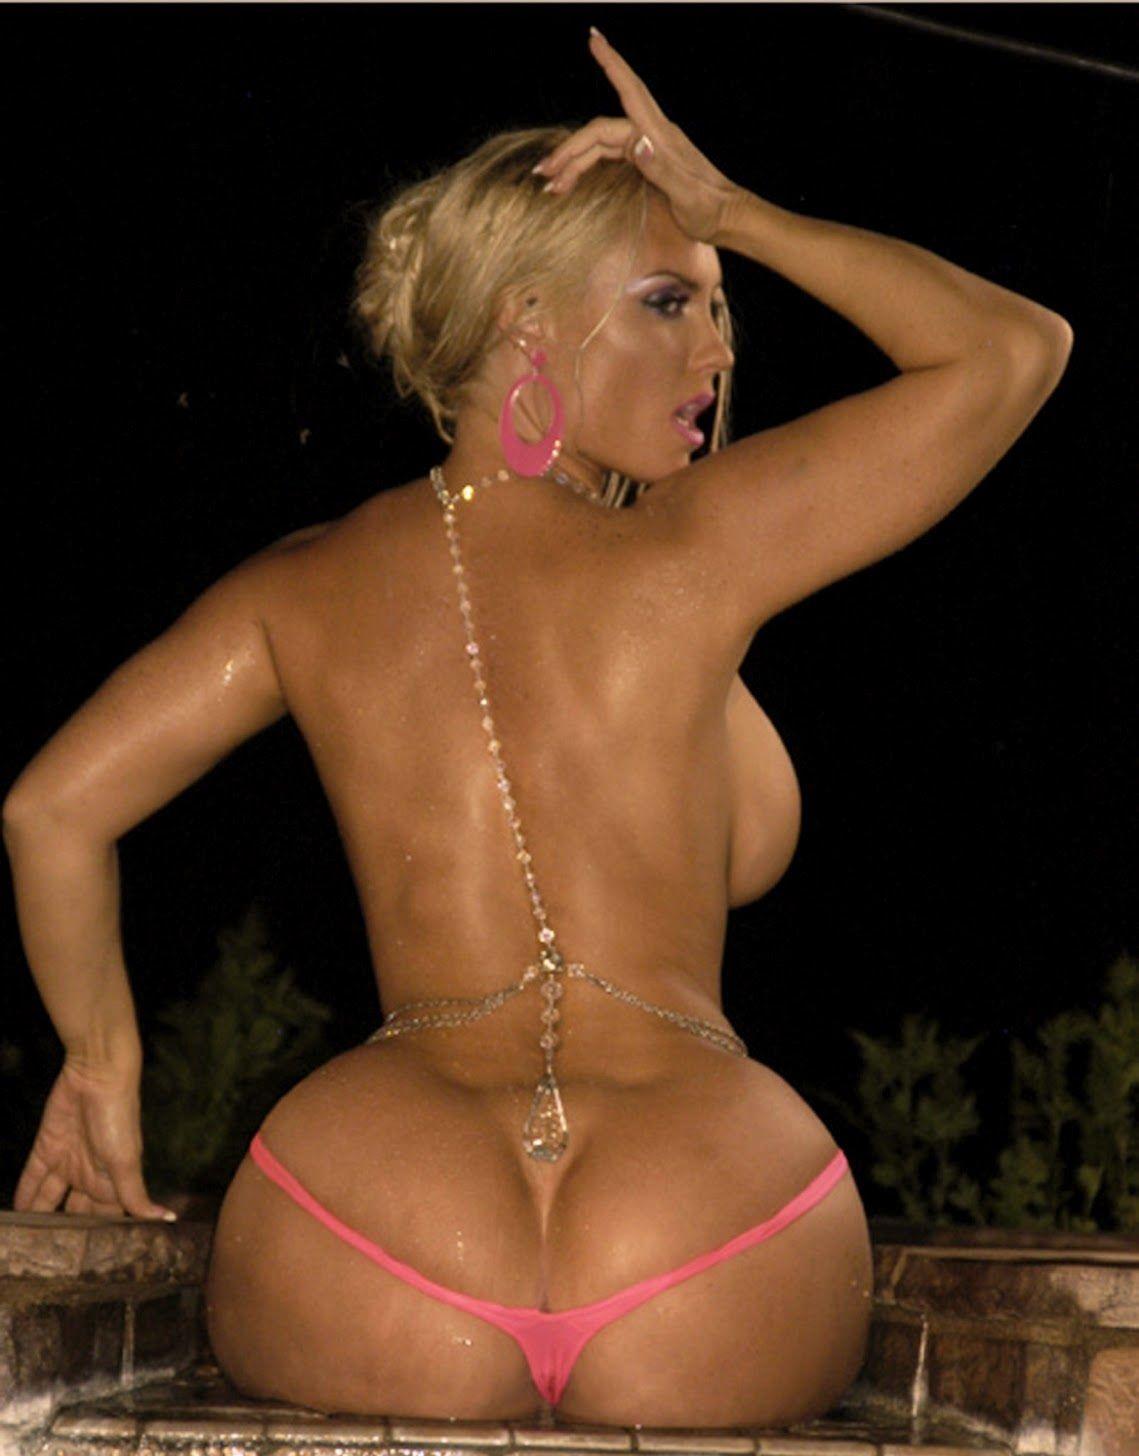 nude my size barbie pics